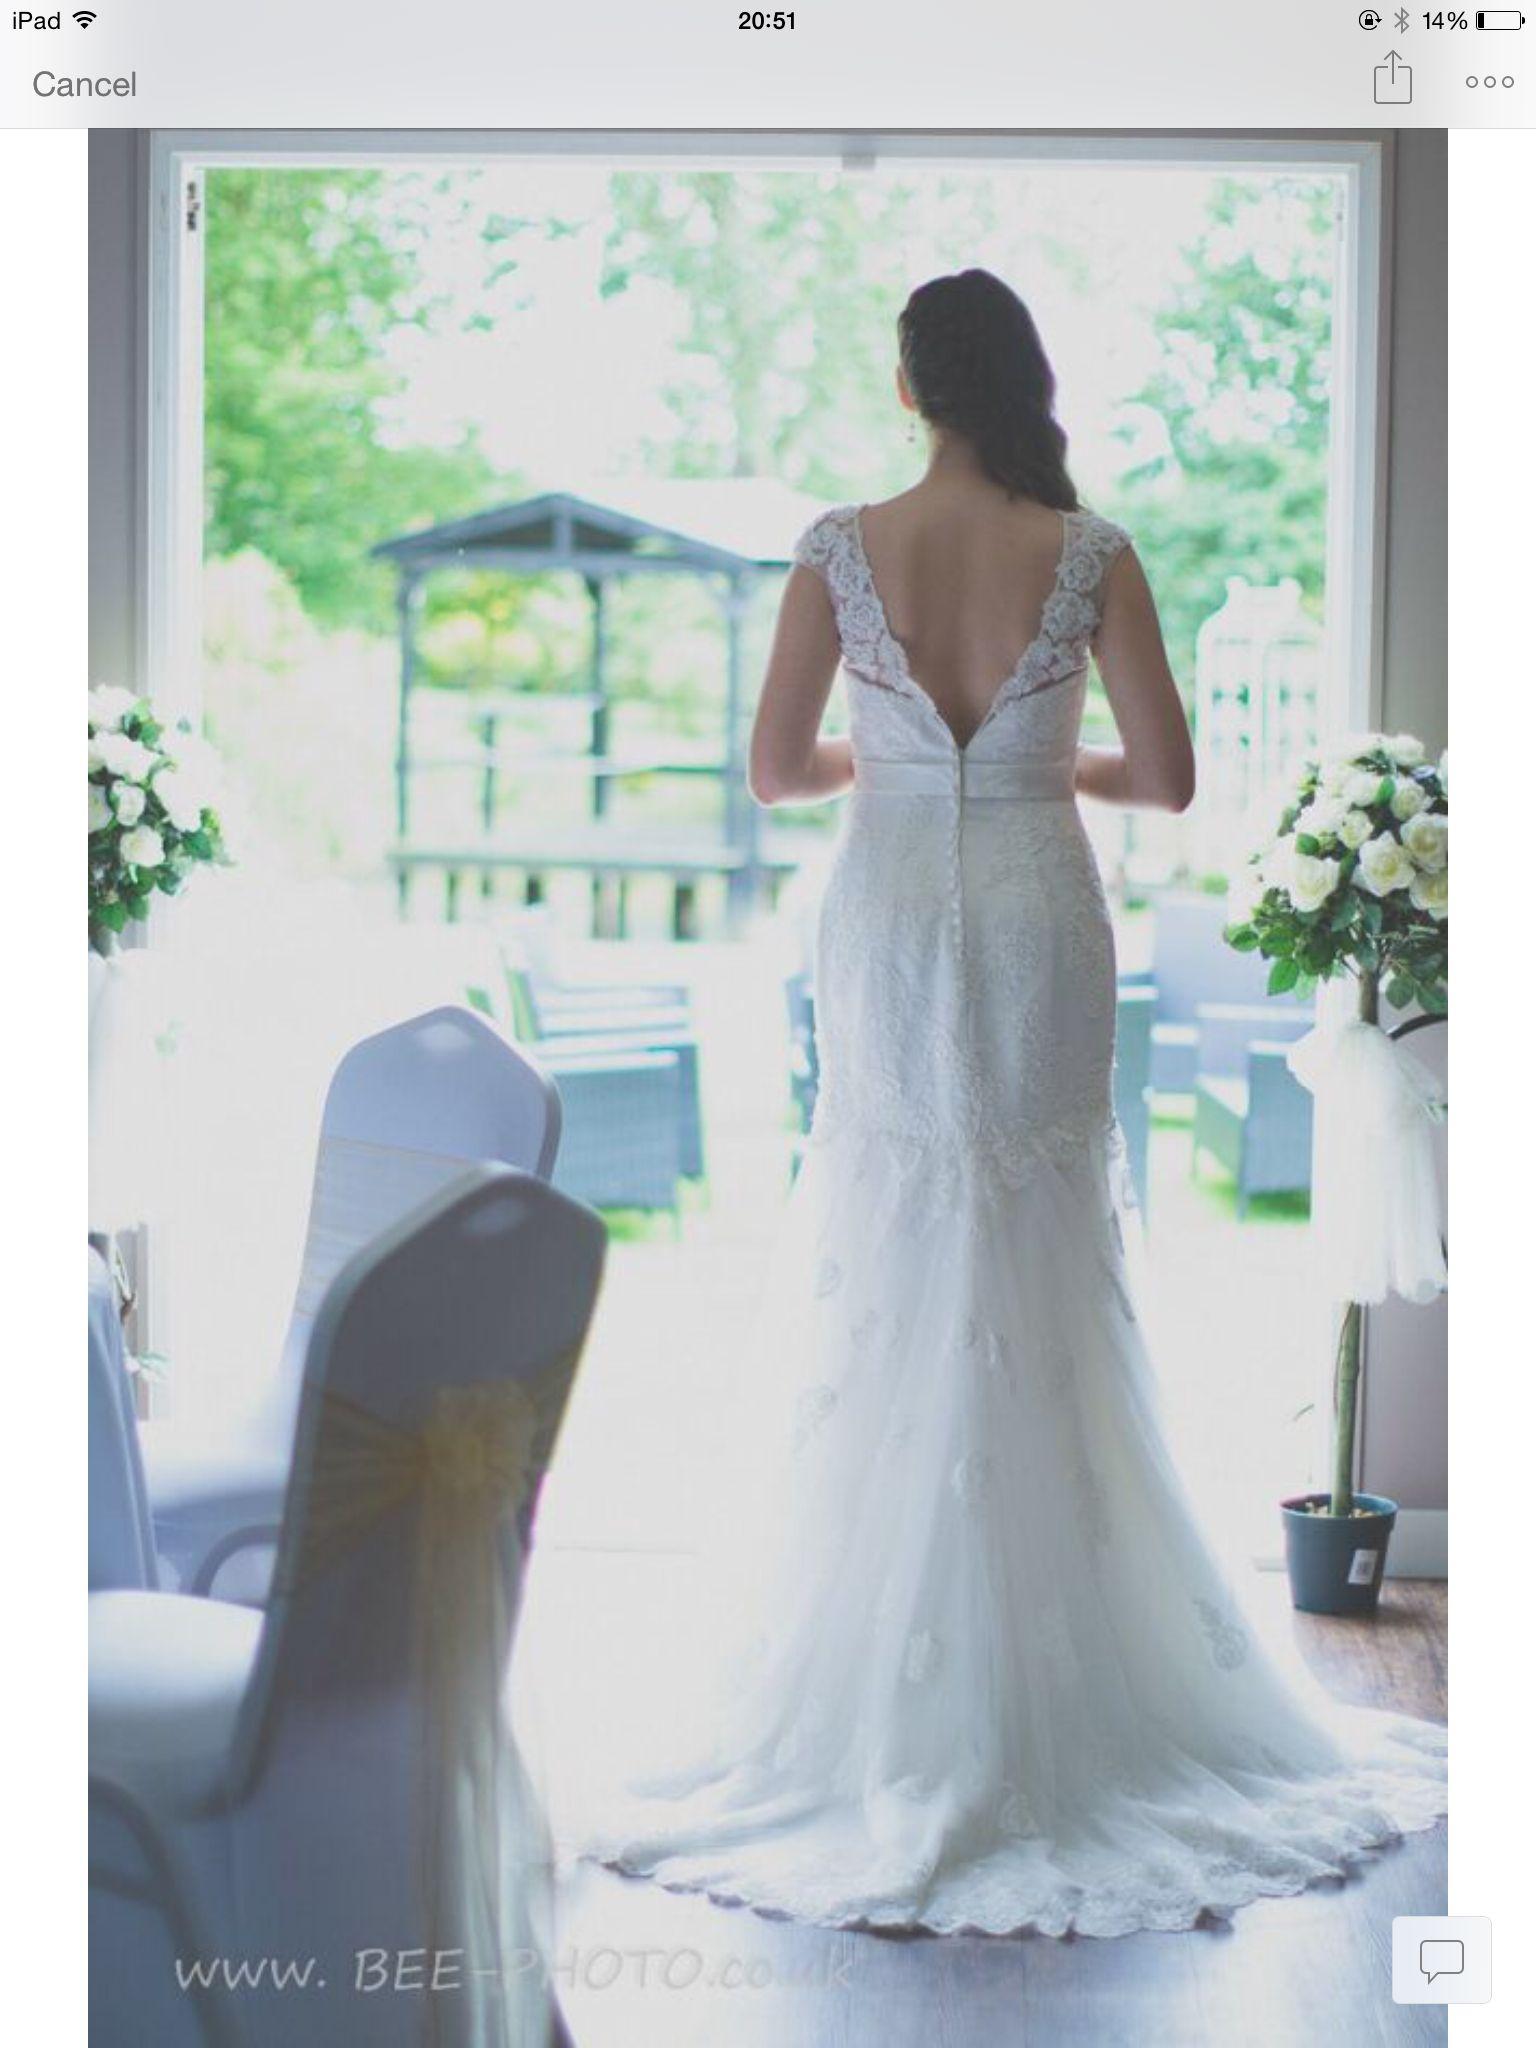 Dress wedding gown back bride bridal hair | Swavesey windmill ...